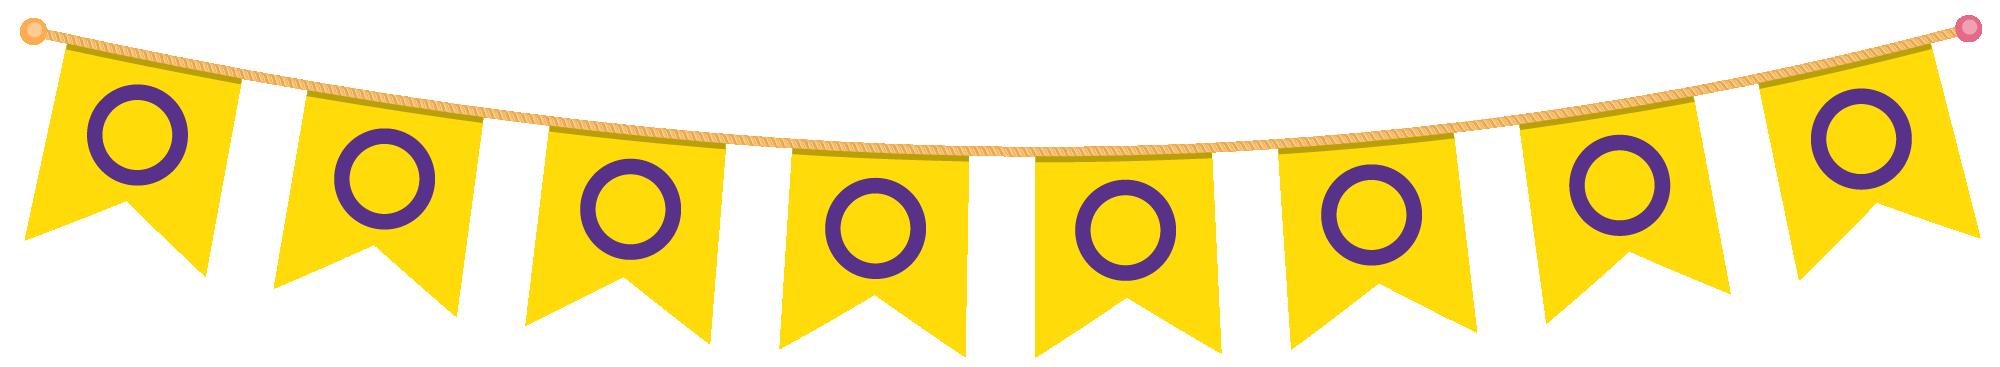 Paginaversiering: een slinger met intersekse-vlaggetjes